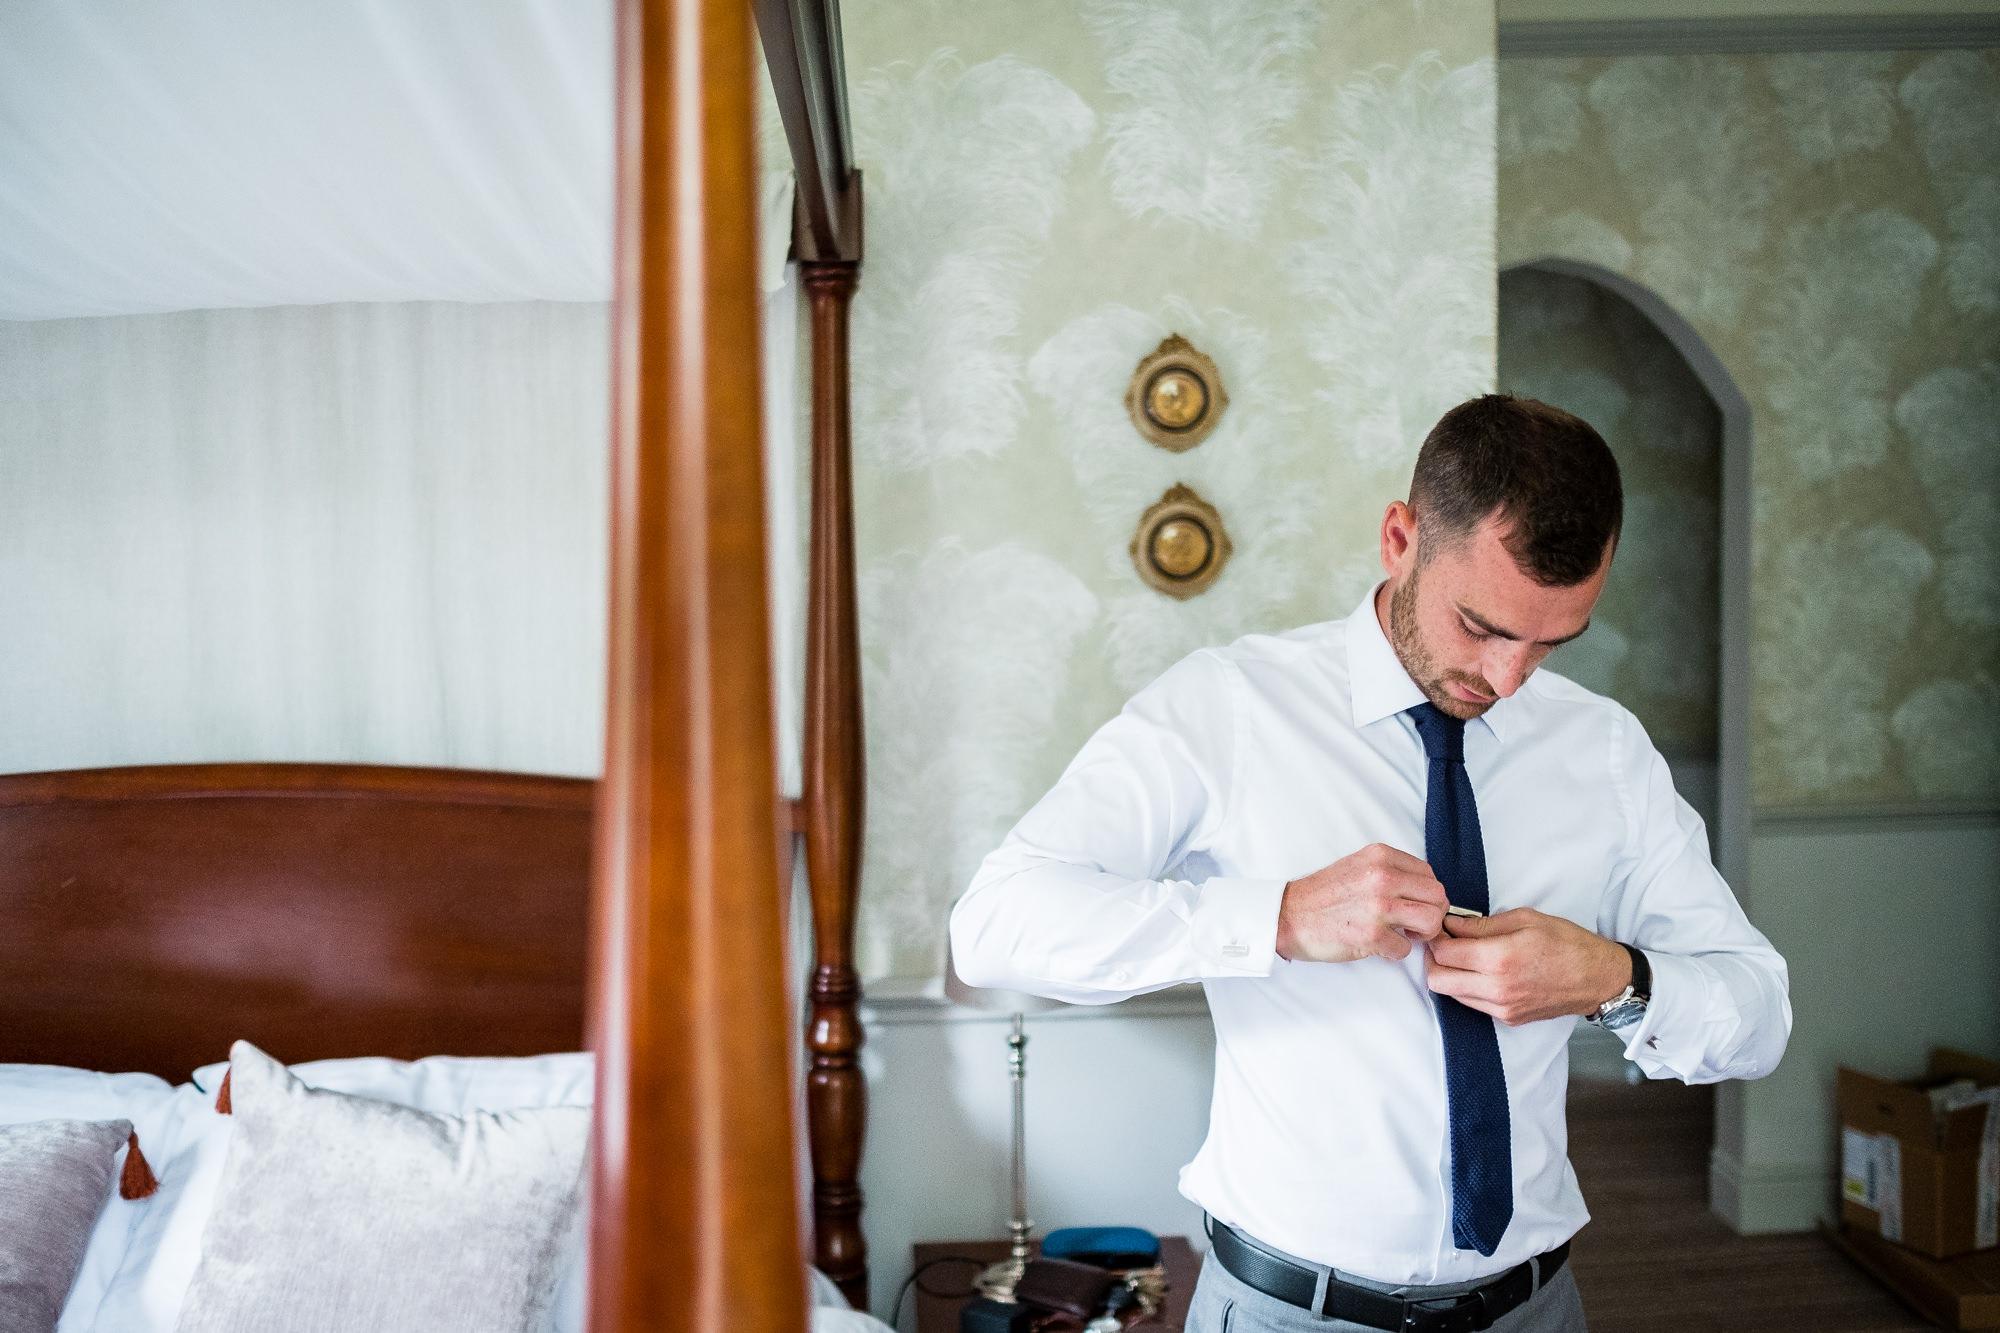 fastening up wedding suit